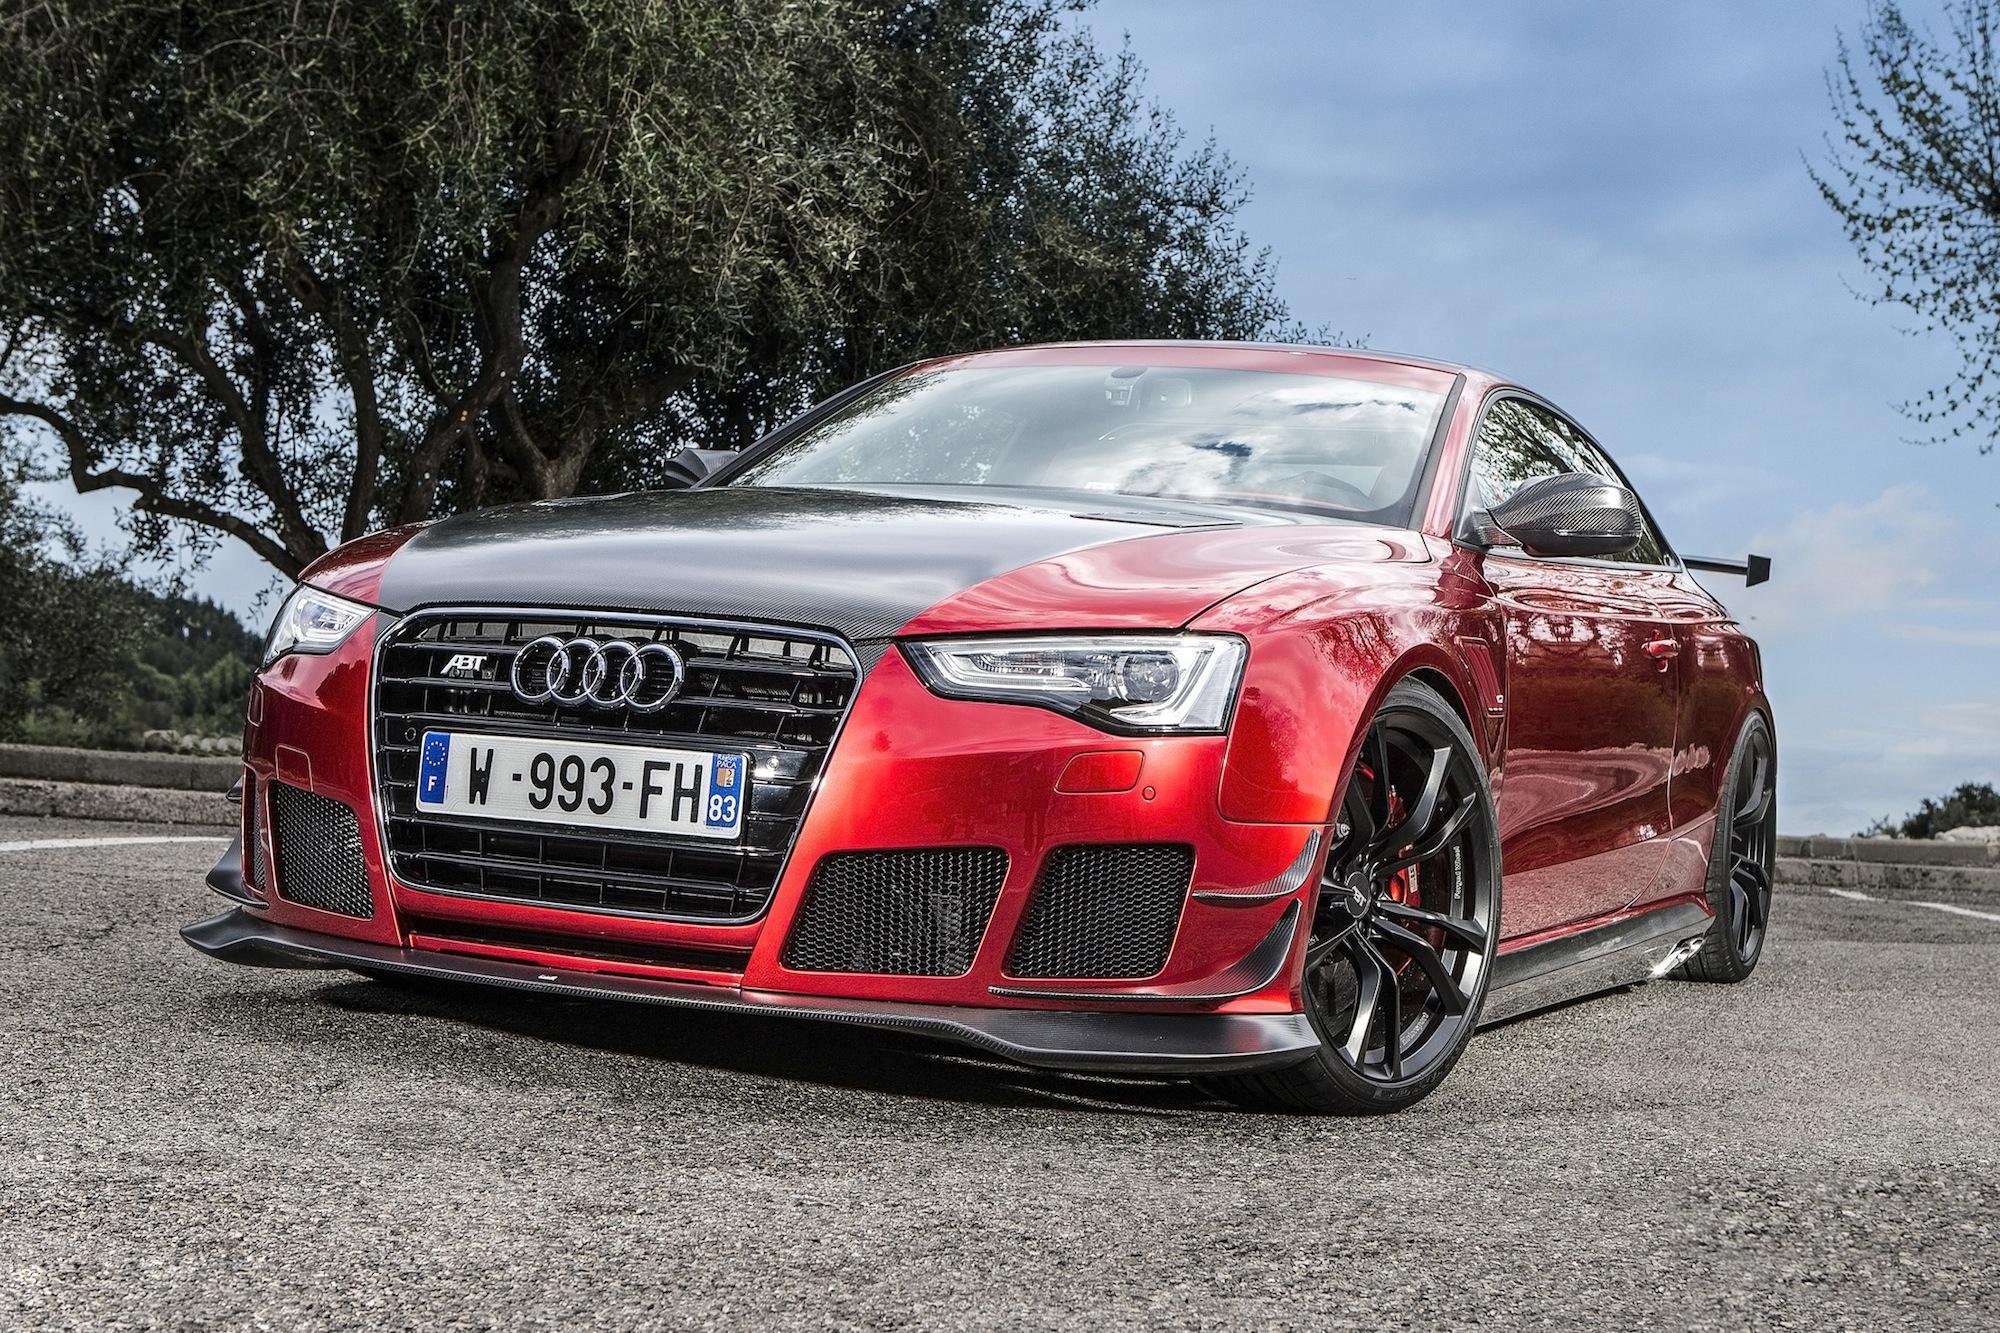 144962 descargar fondo de pantalla Coches, Audi, Rs5-R, Puesta A Punto, Vista Frontal: protectores de pantalla e imágenes gratis